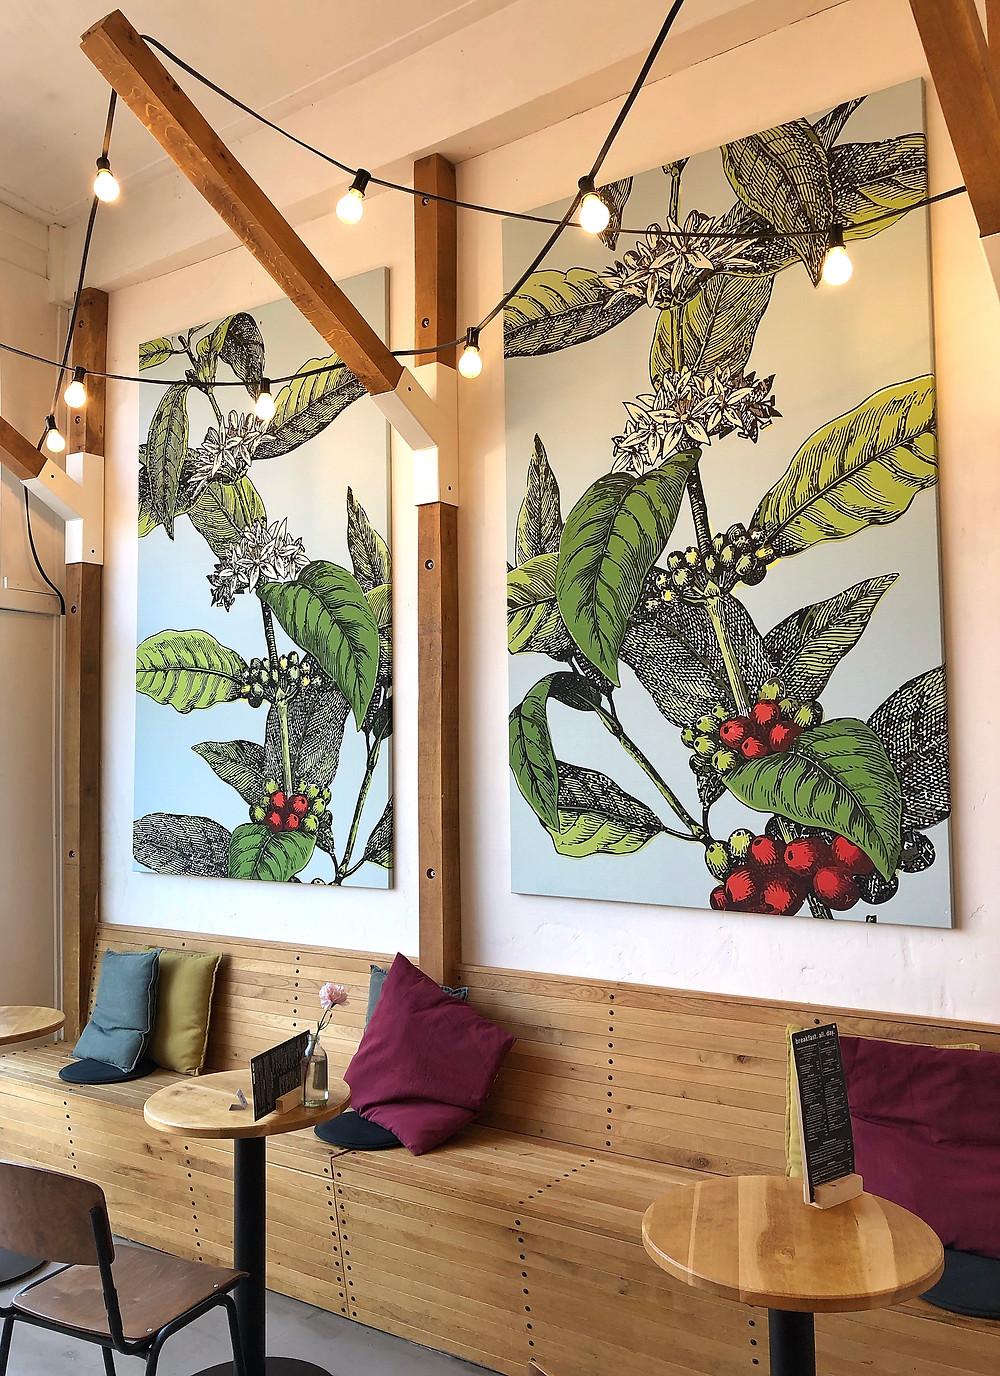 '30ml Coffee & Food' in Leiden